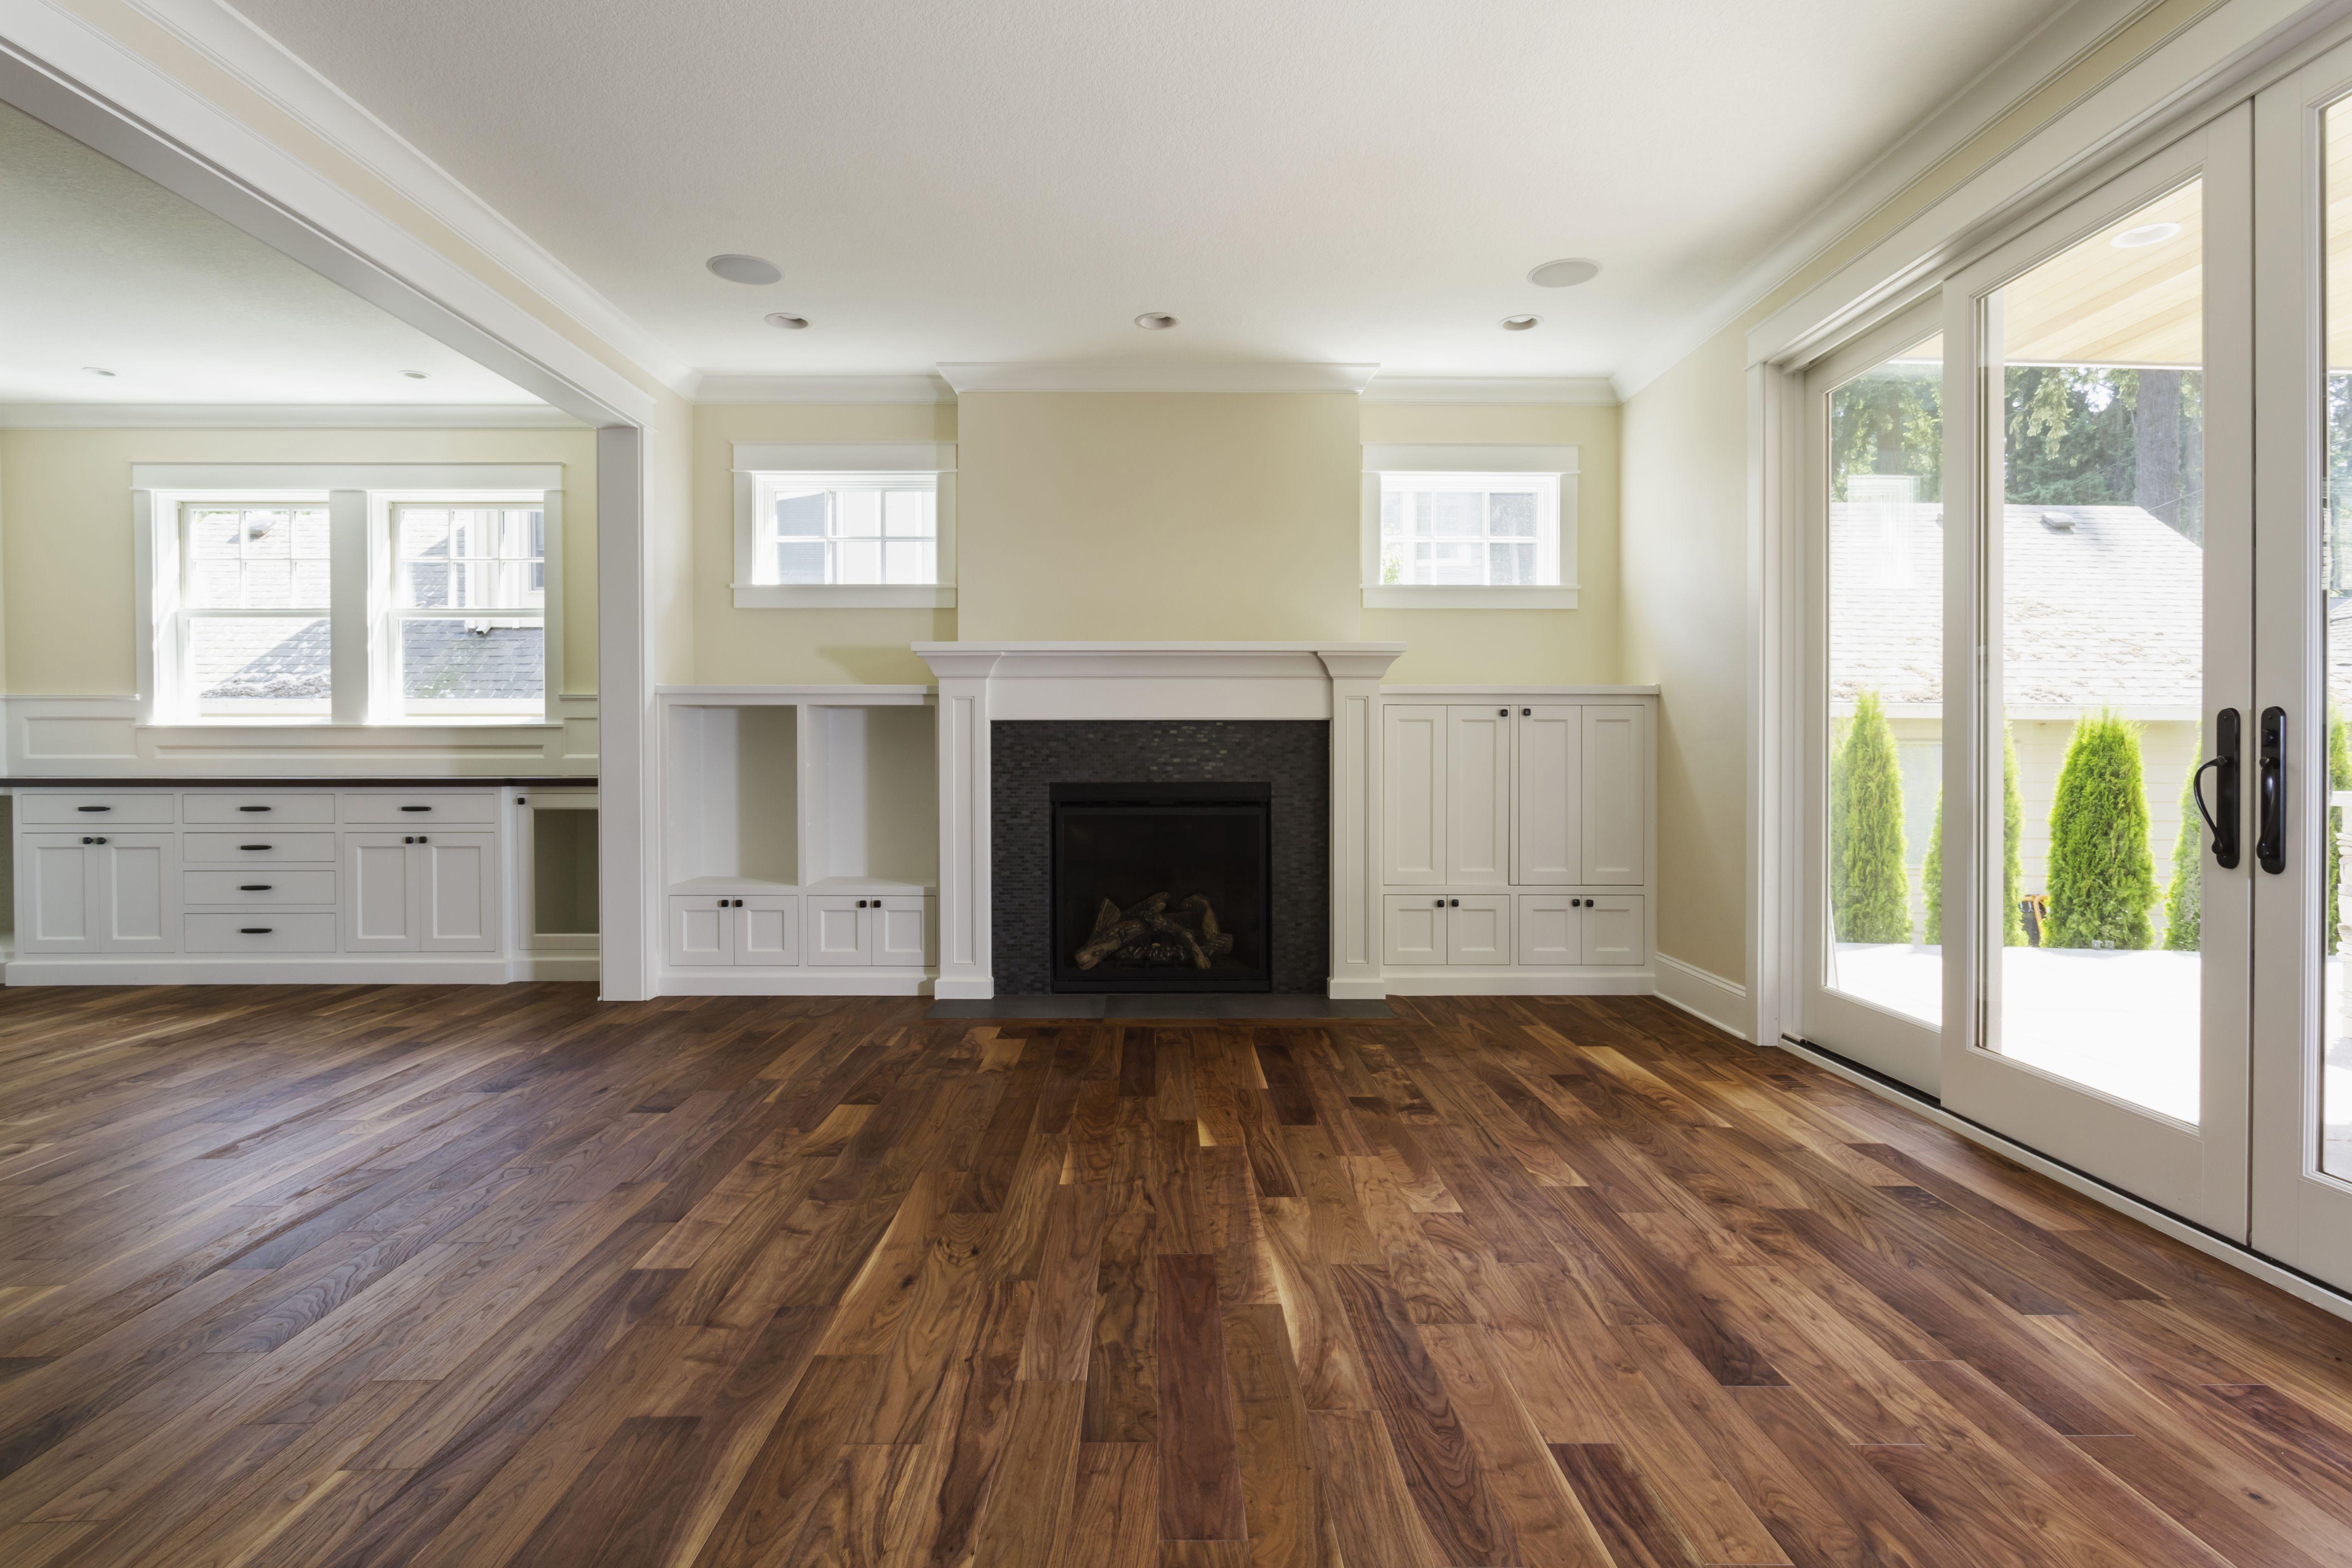 refinishing hardwood floors filling gaps of the pros and cons of prefinished hardwood flooring with fireplace and built in shelves in living room 482143011 57bef8e33df78cc16e035397